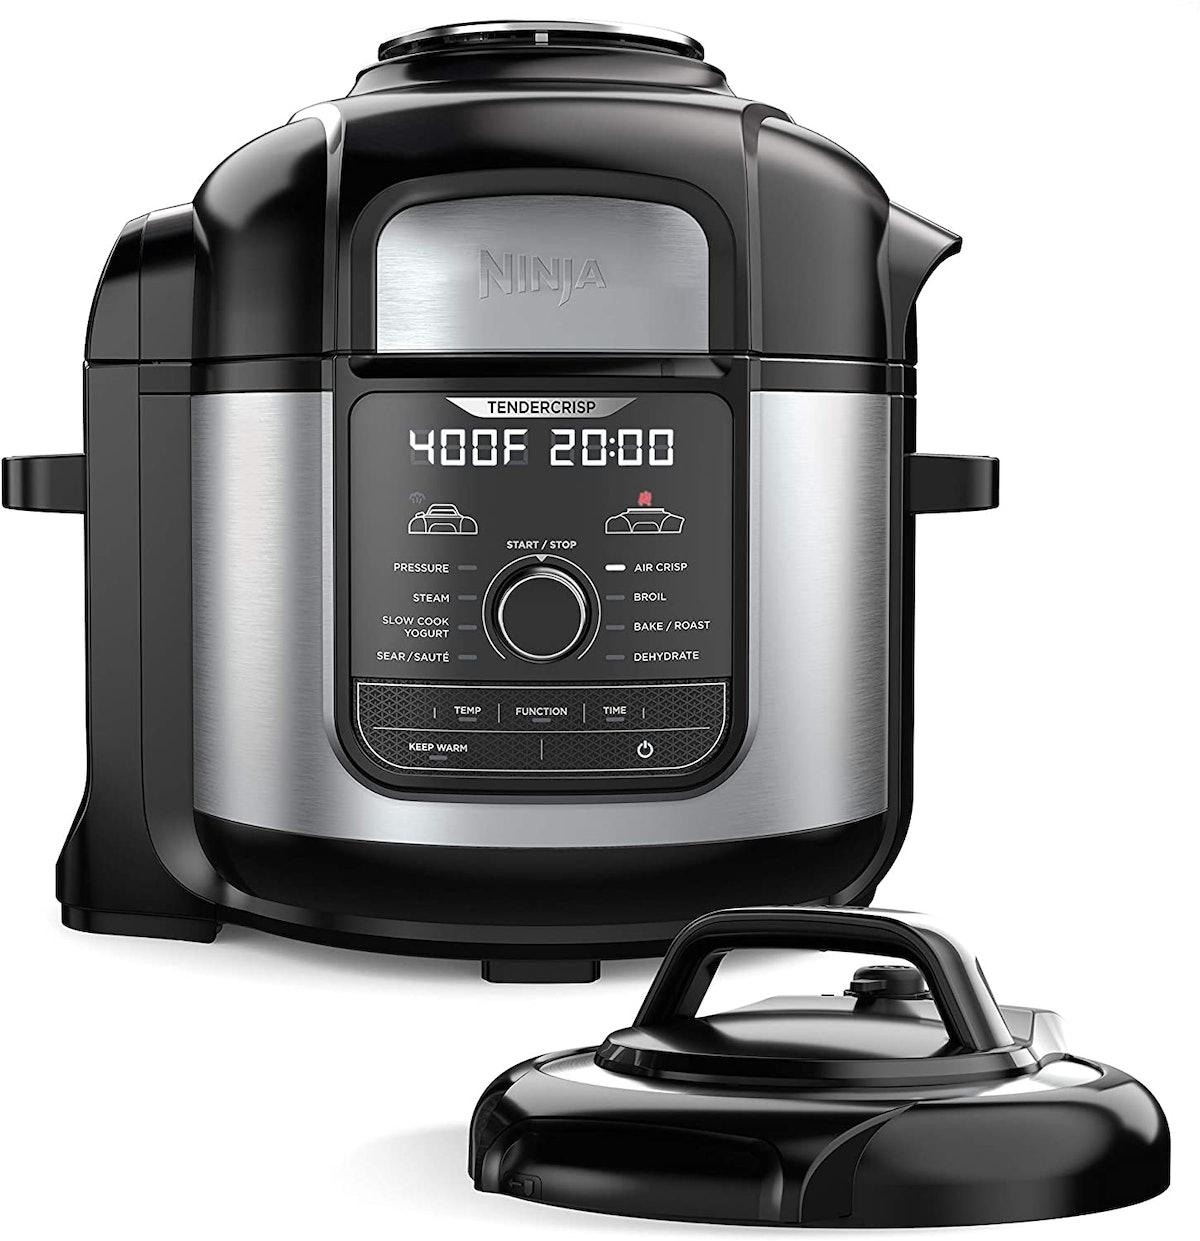 Ninja FD401 8-Quart Pressure Cooker